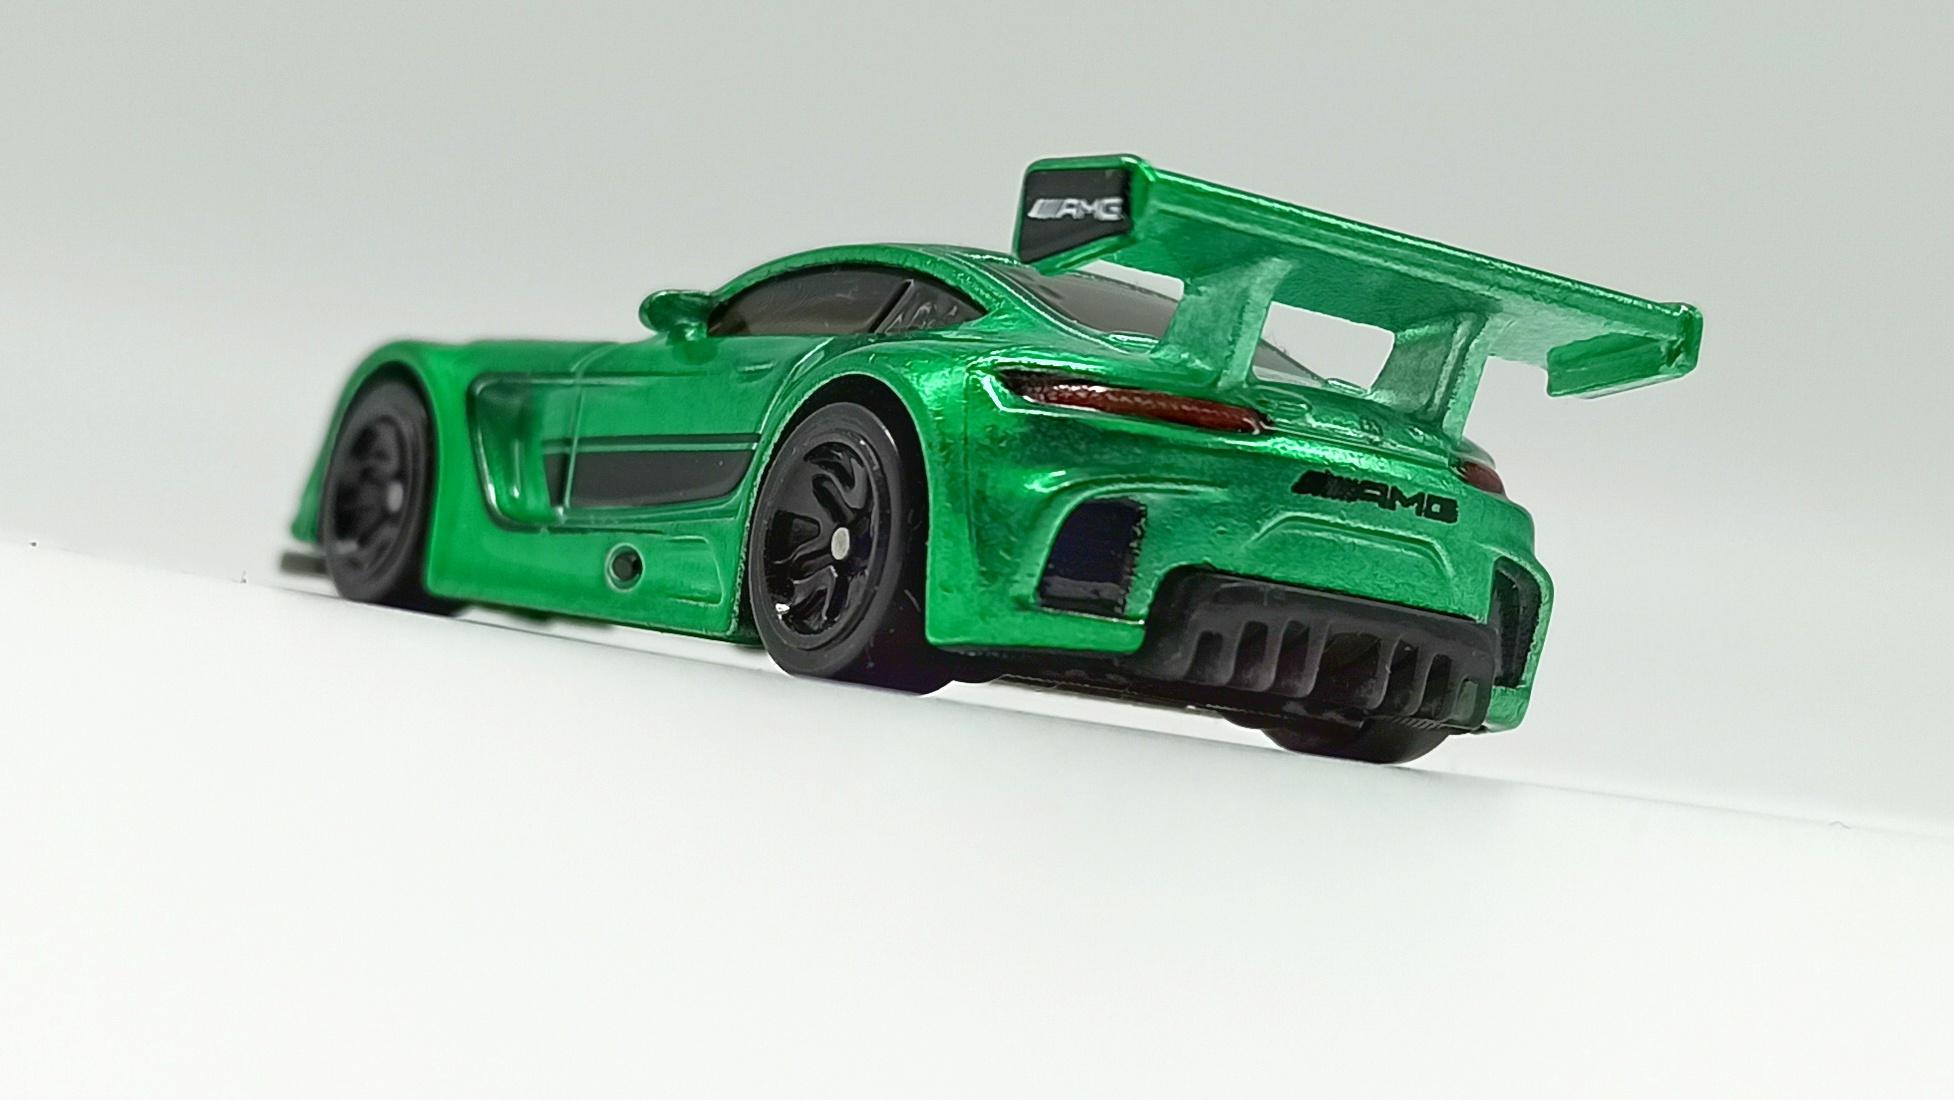 Hot Wheels id '16 Mercedes-AMG GT3 (GML21) 2021 Factory Fresh (03/04) spectraflame green back angle